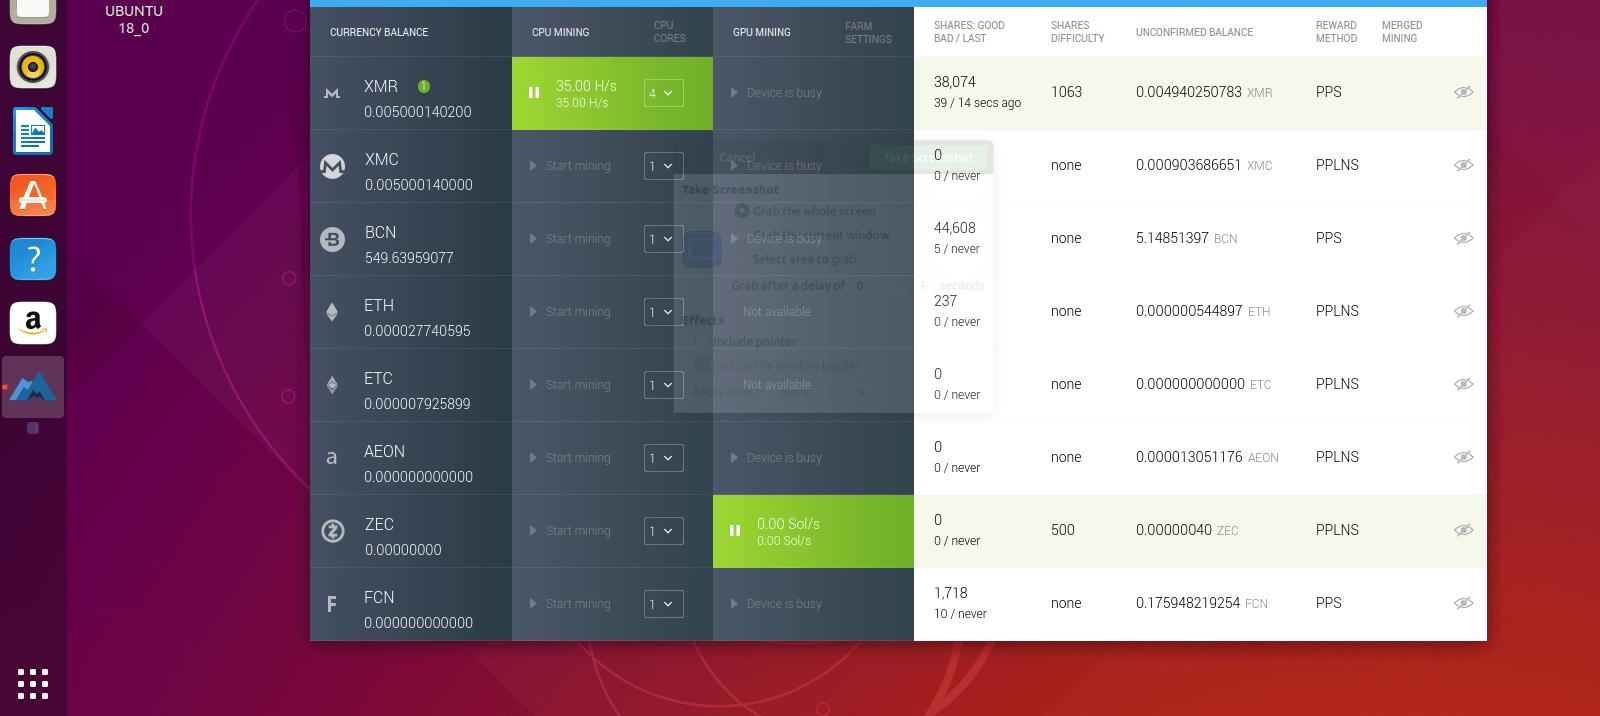 Mining Bitcoin on Ubuntu with MinerGate